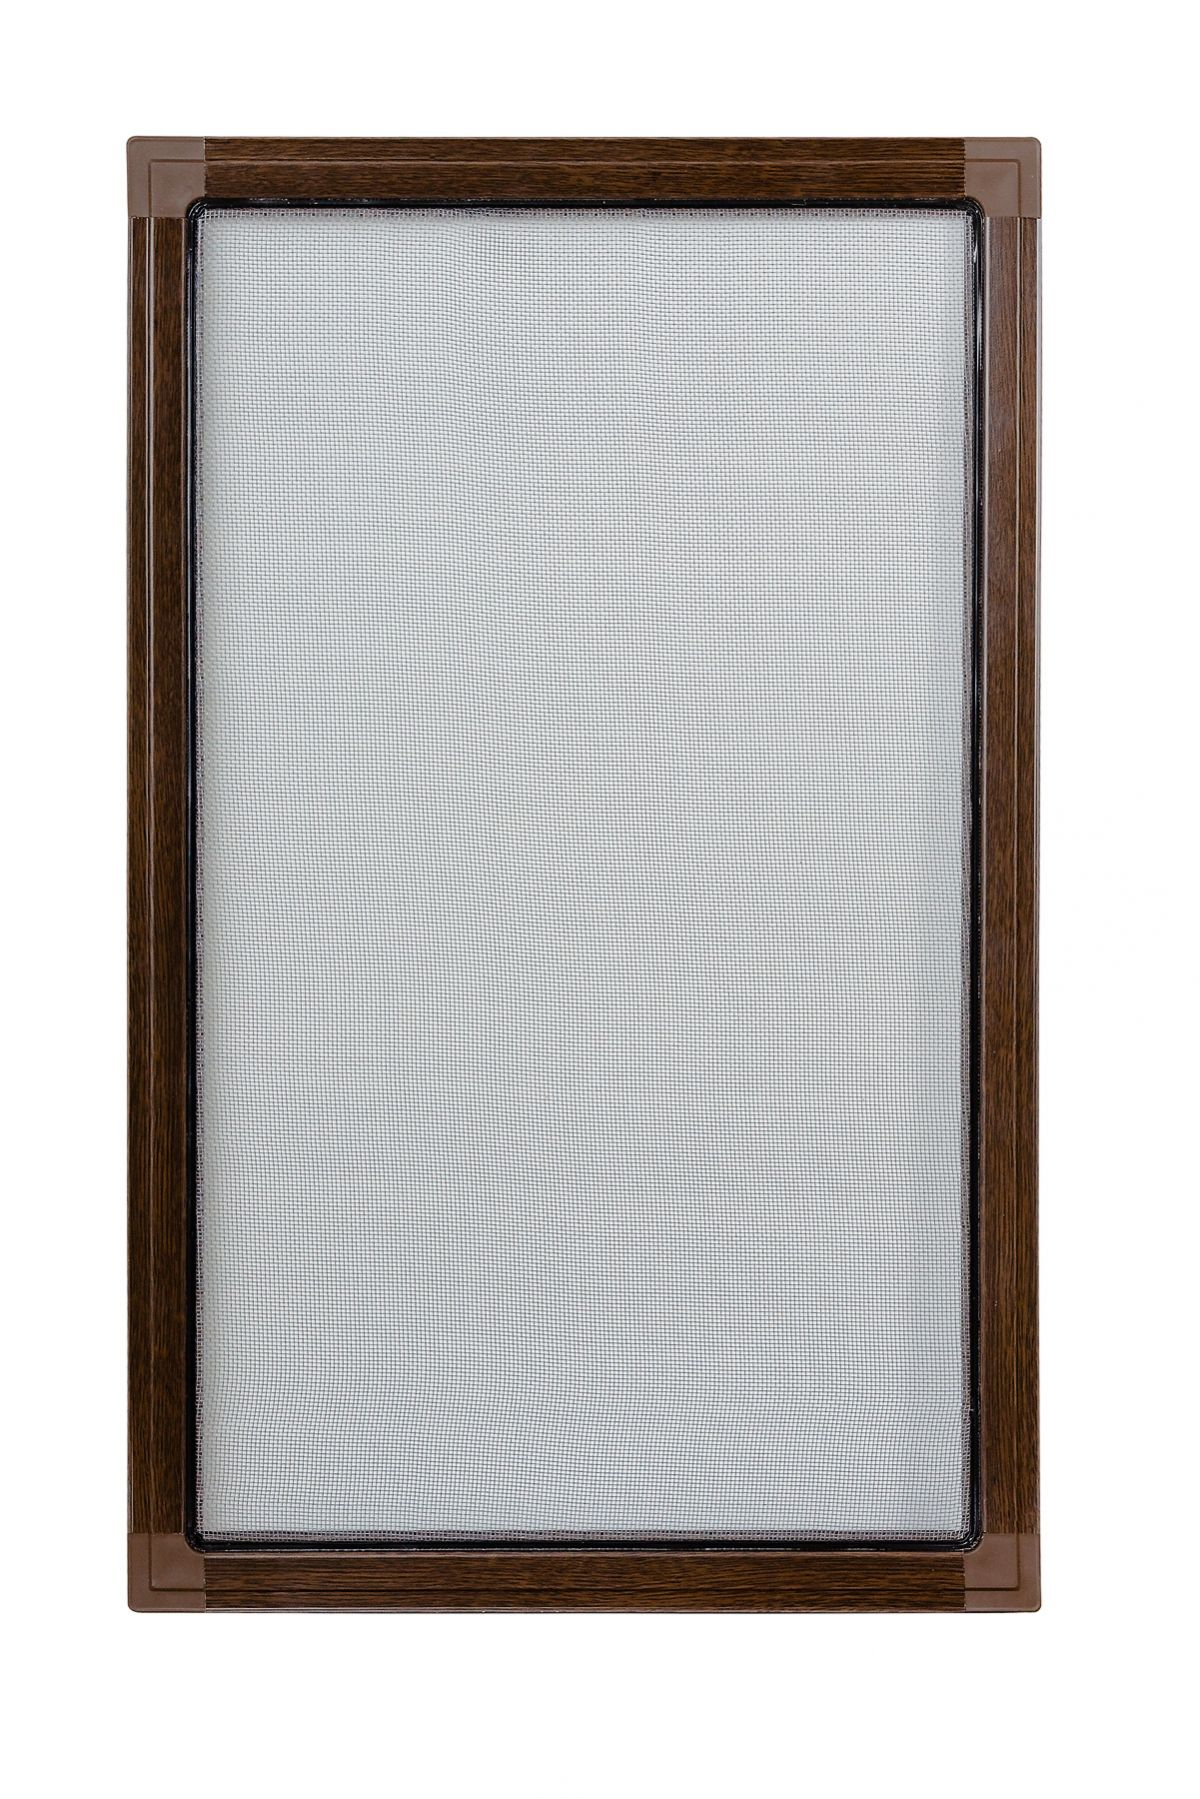 Moskitiery okienne Moskitiera ramkowa - orzech, siatka szara